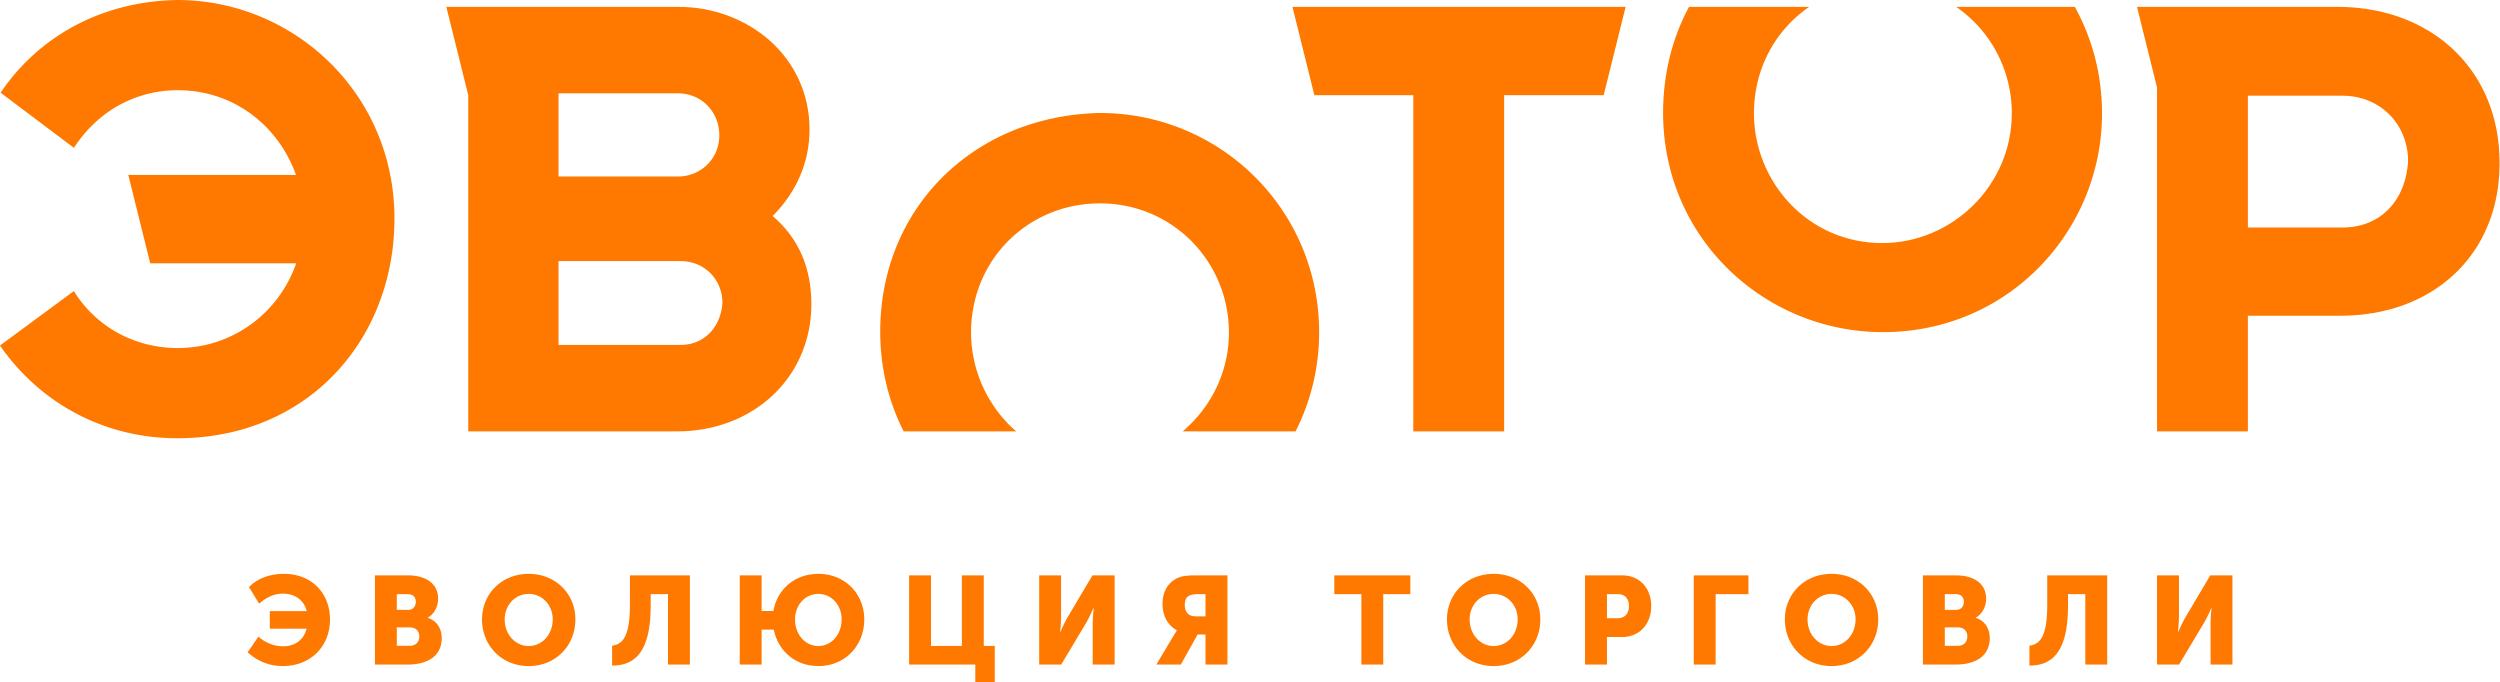 Эвотор